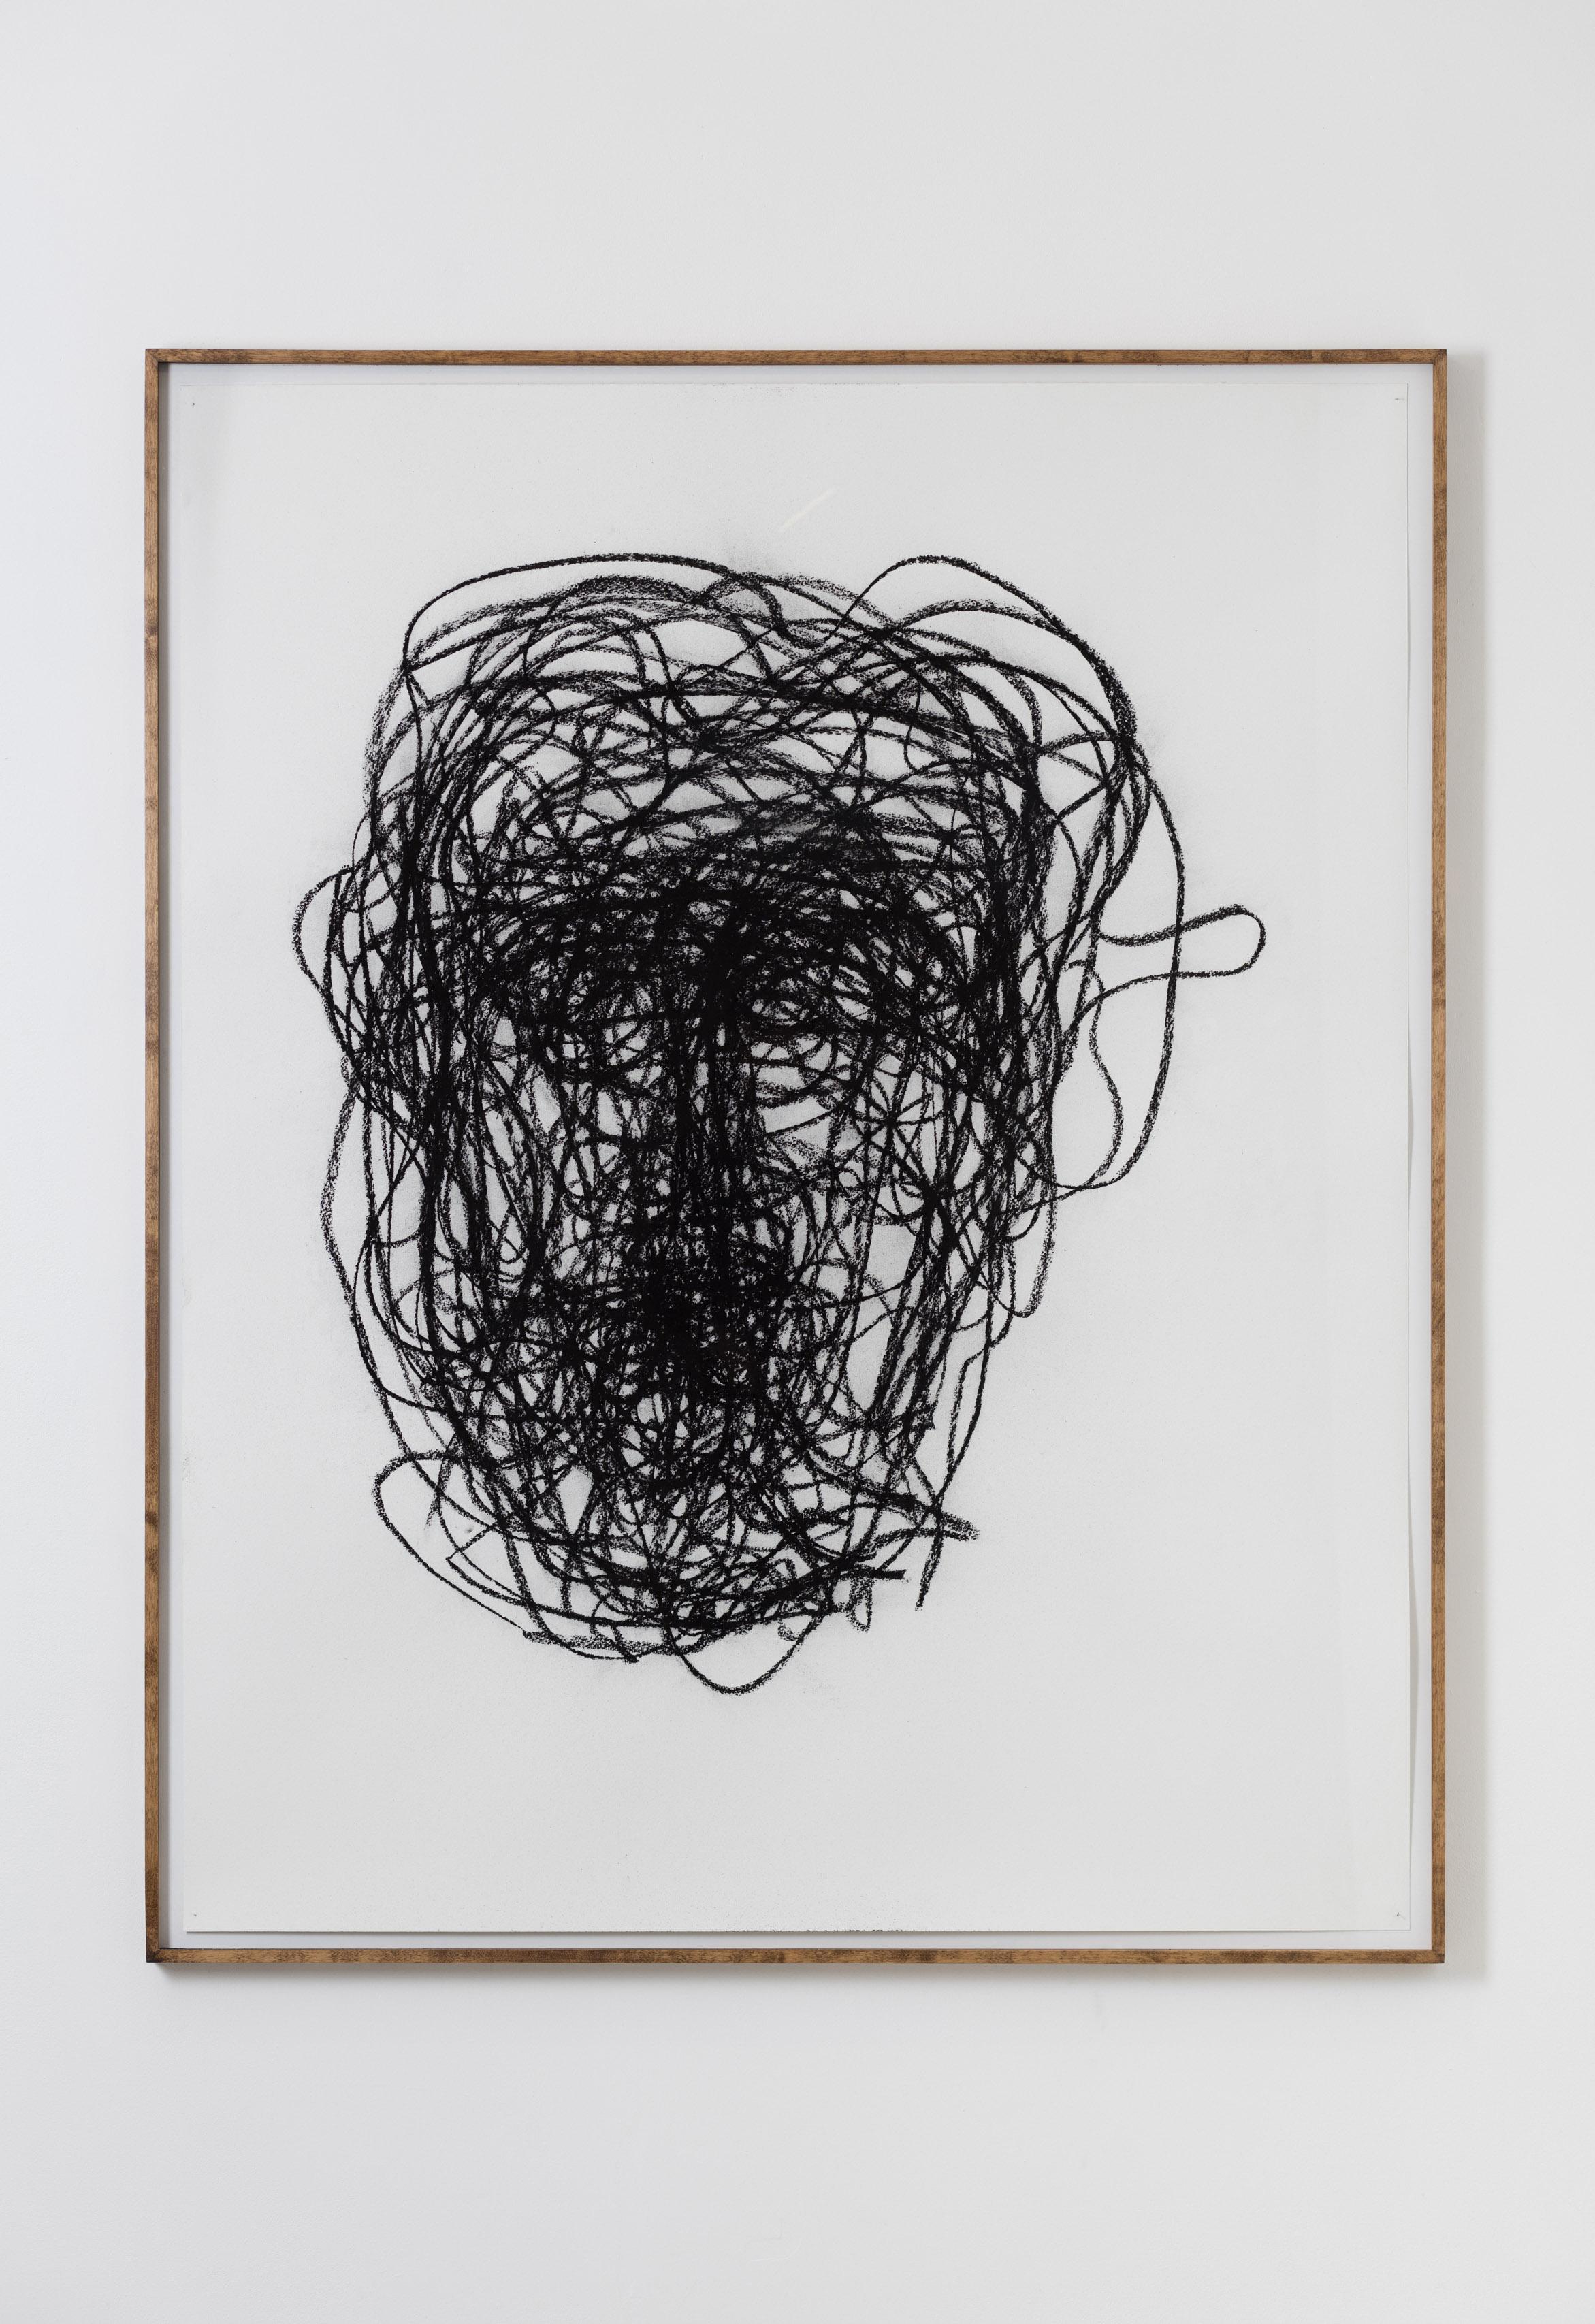 JocJonJosch Self Portrait, 1st August 2016, charcoal and paper, 2016